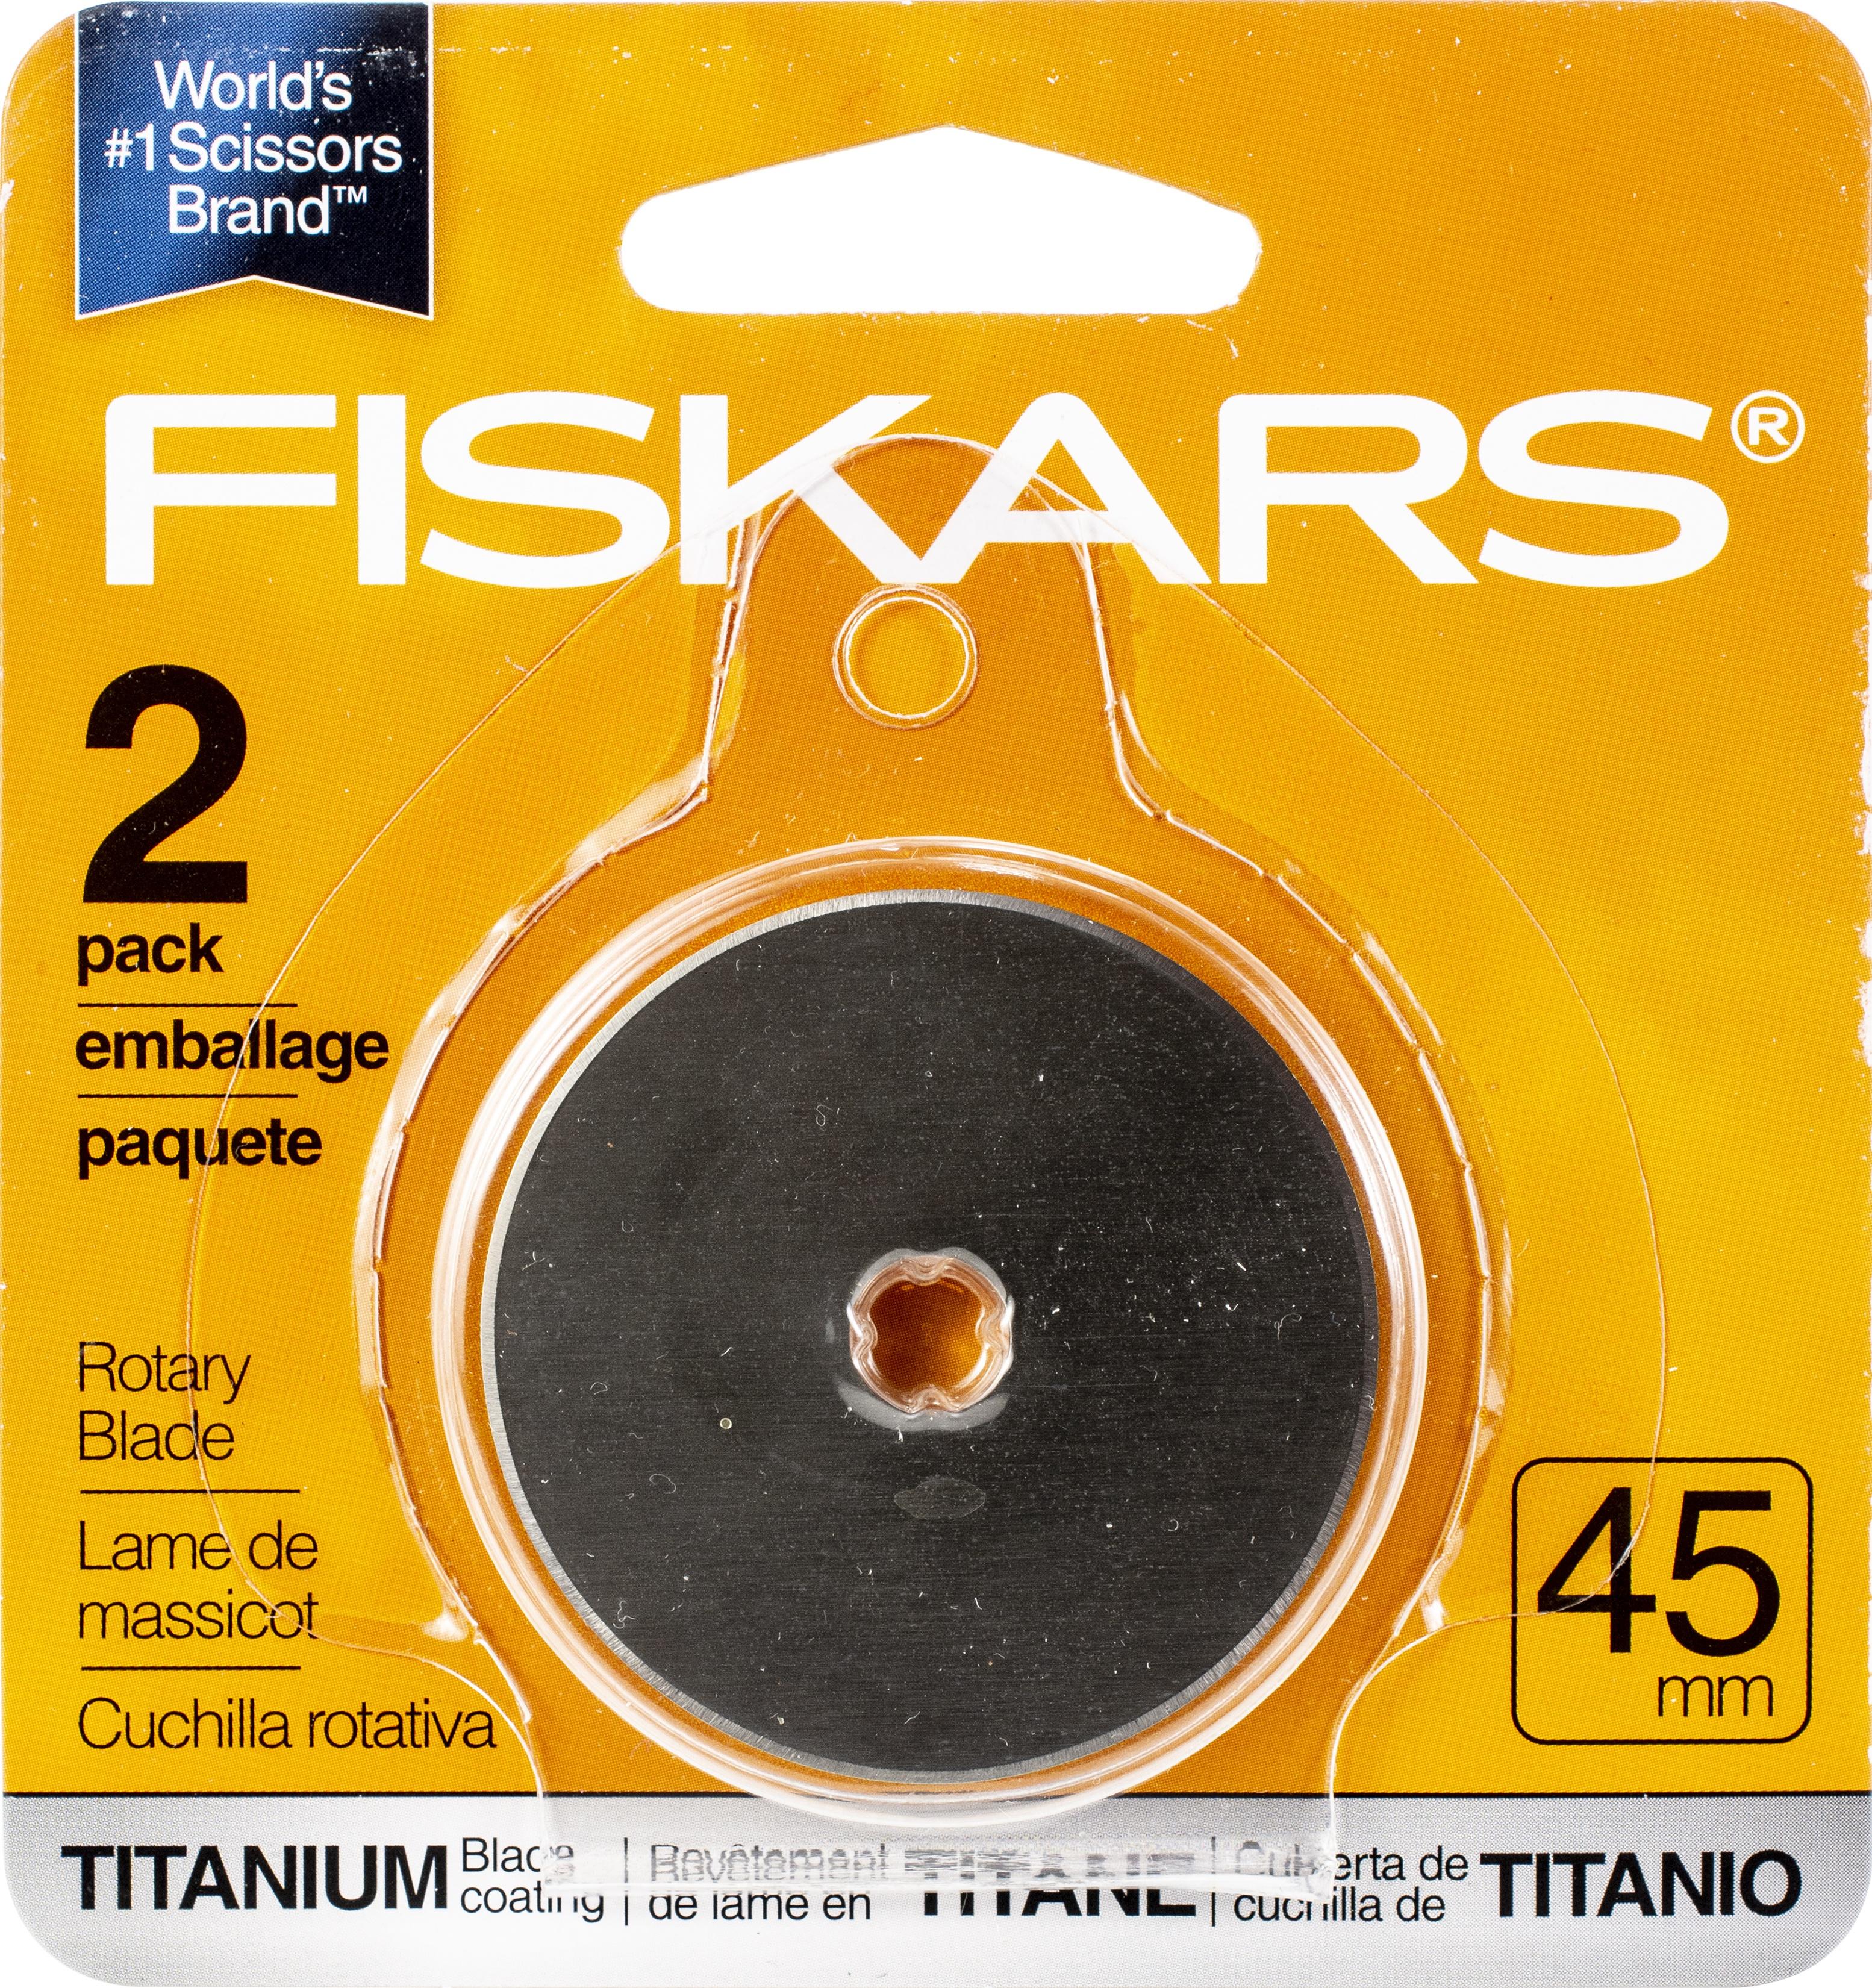 Fiskars 45 mm rotary blades